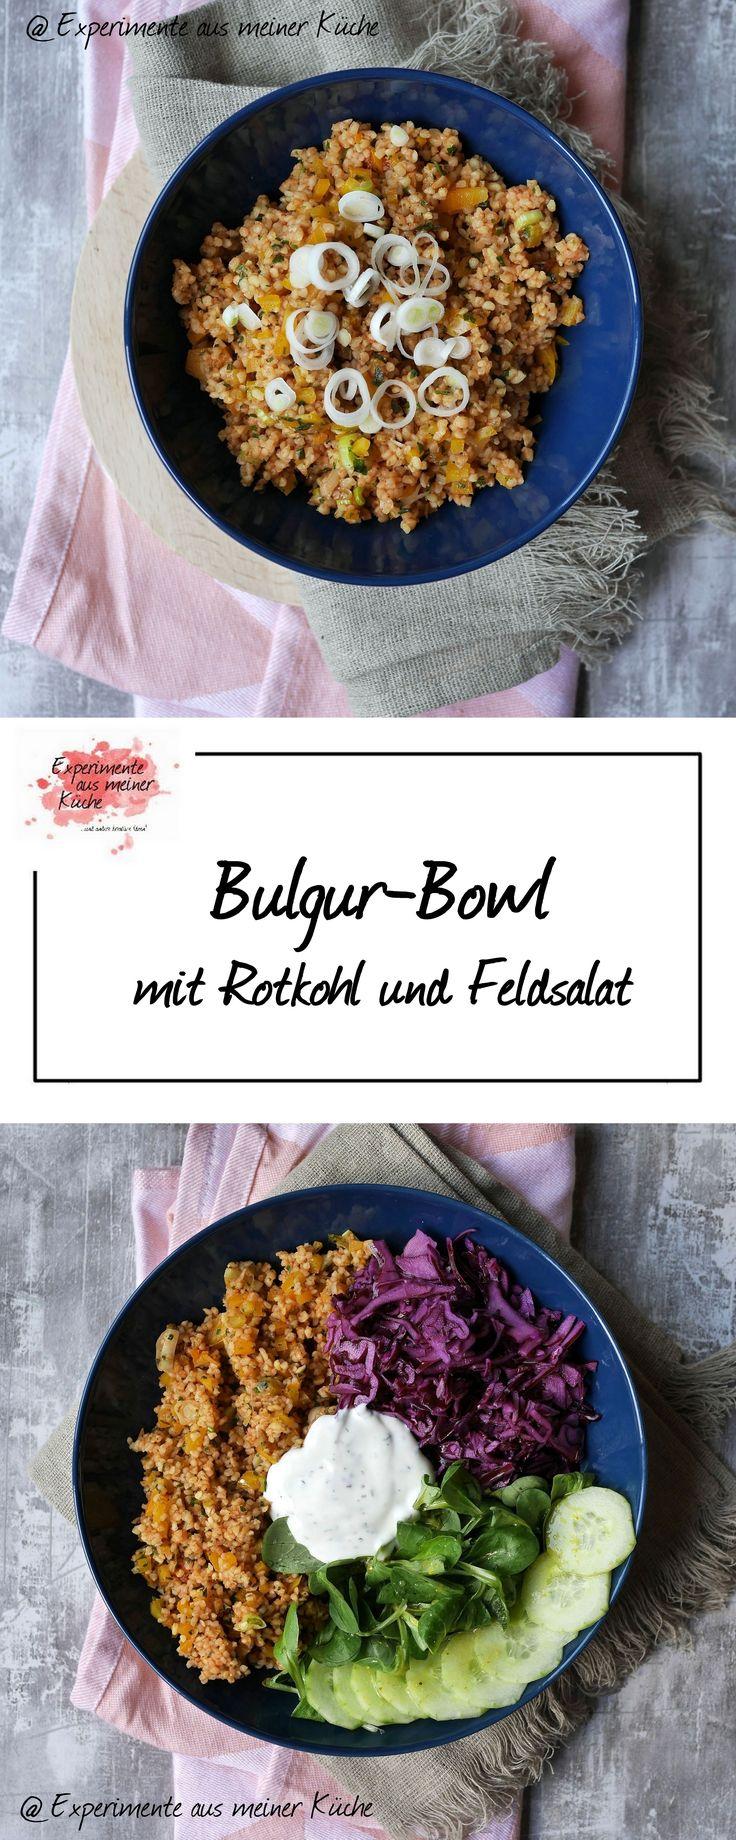 die besten 25 bulgursalat rezept ideen auf pinterest couscous salat orientalisch basische. Black Bedroom Furniture Sets. Home Design Ideas